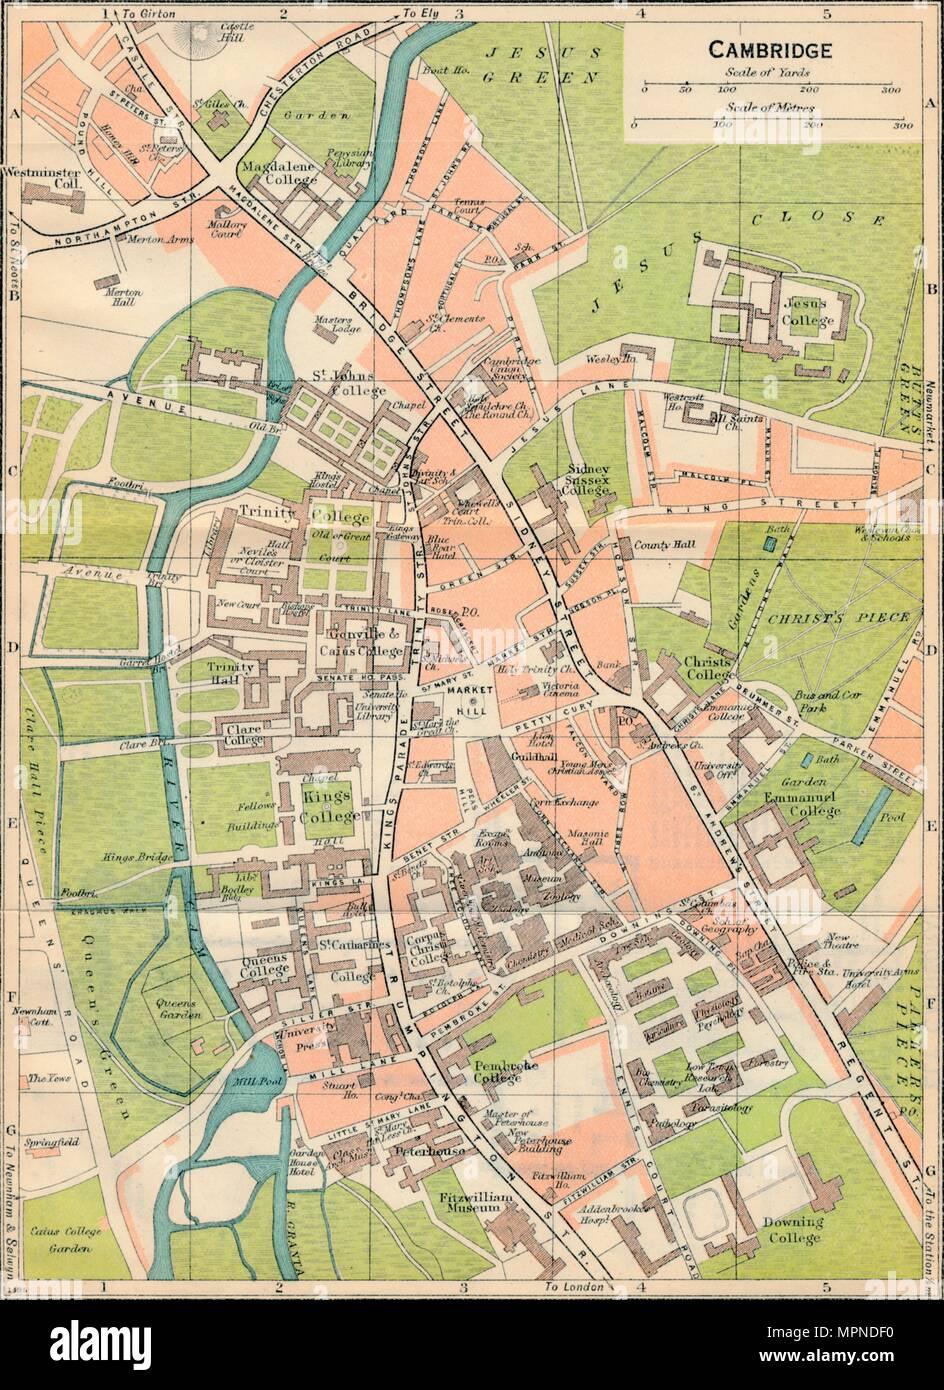 'Cambridge', c20th Century. Artist: John Bartholomew. - Stock Image